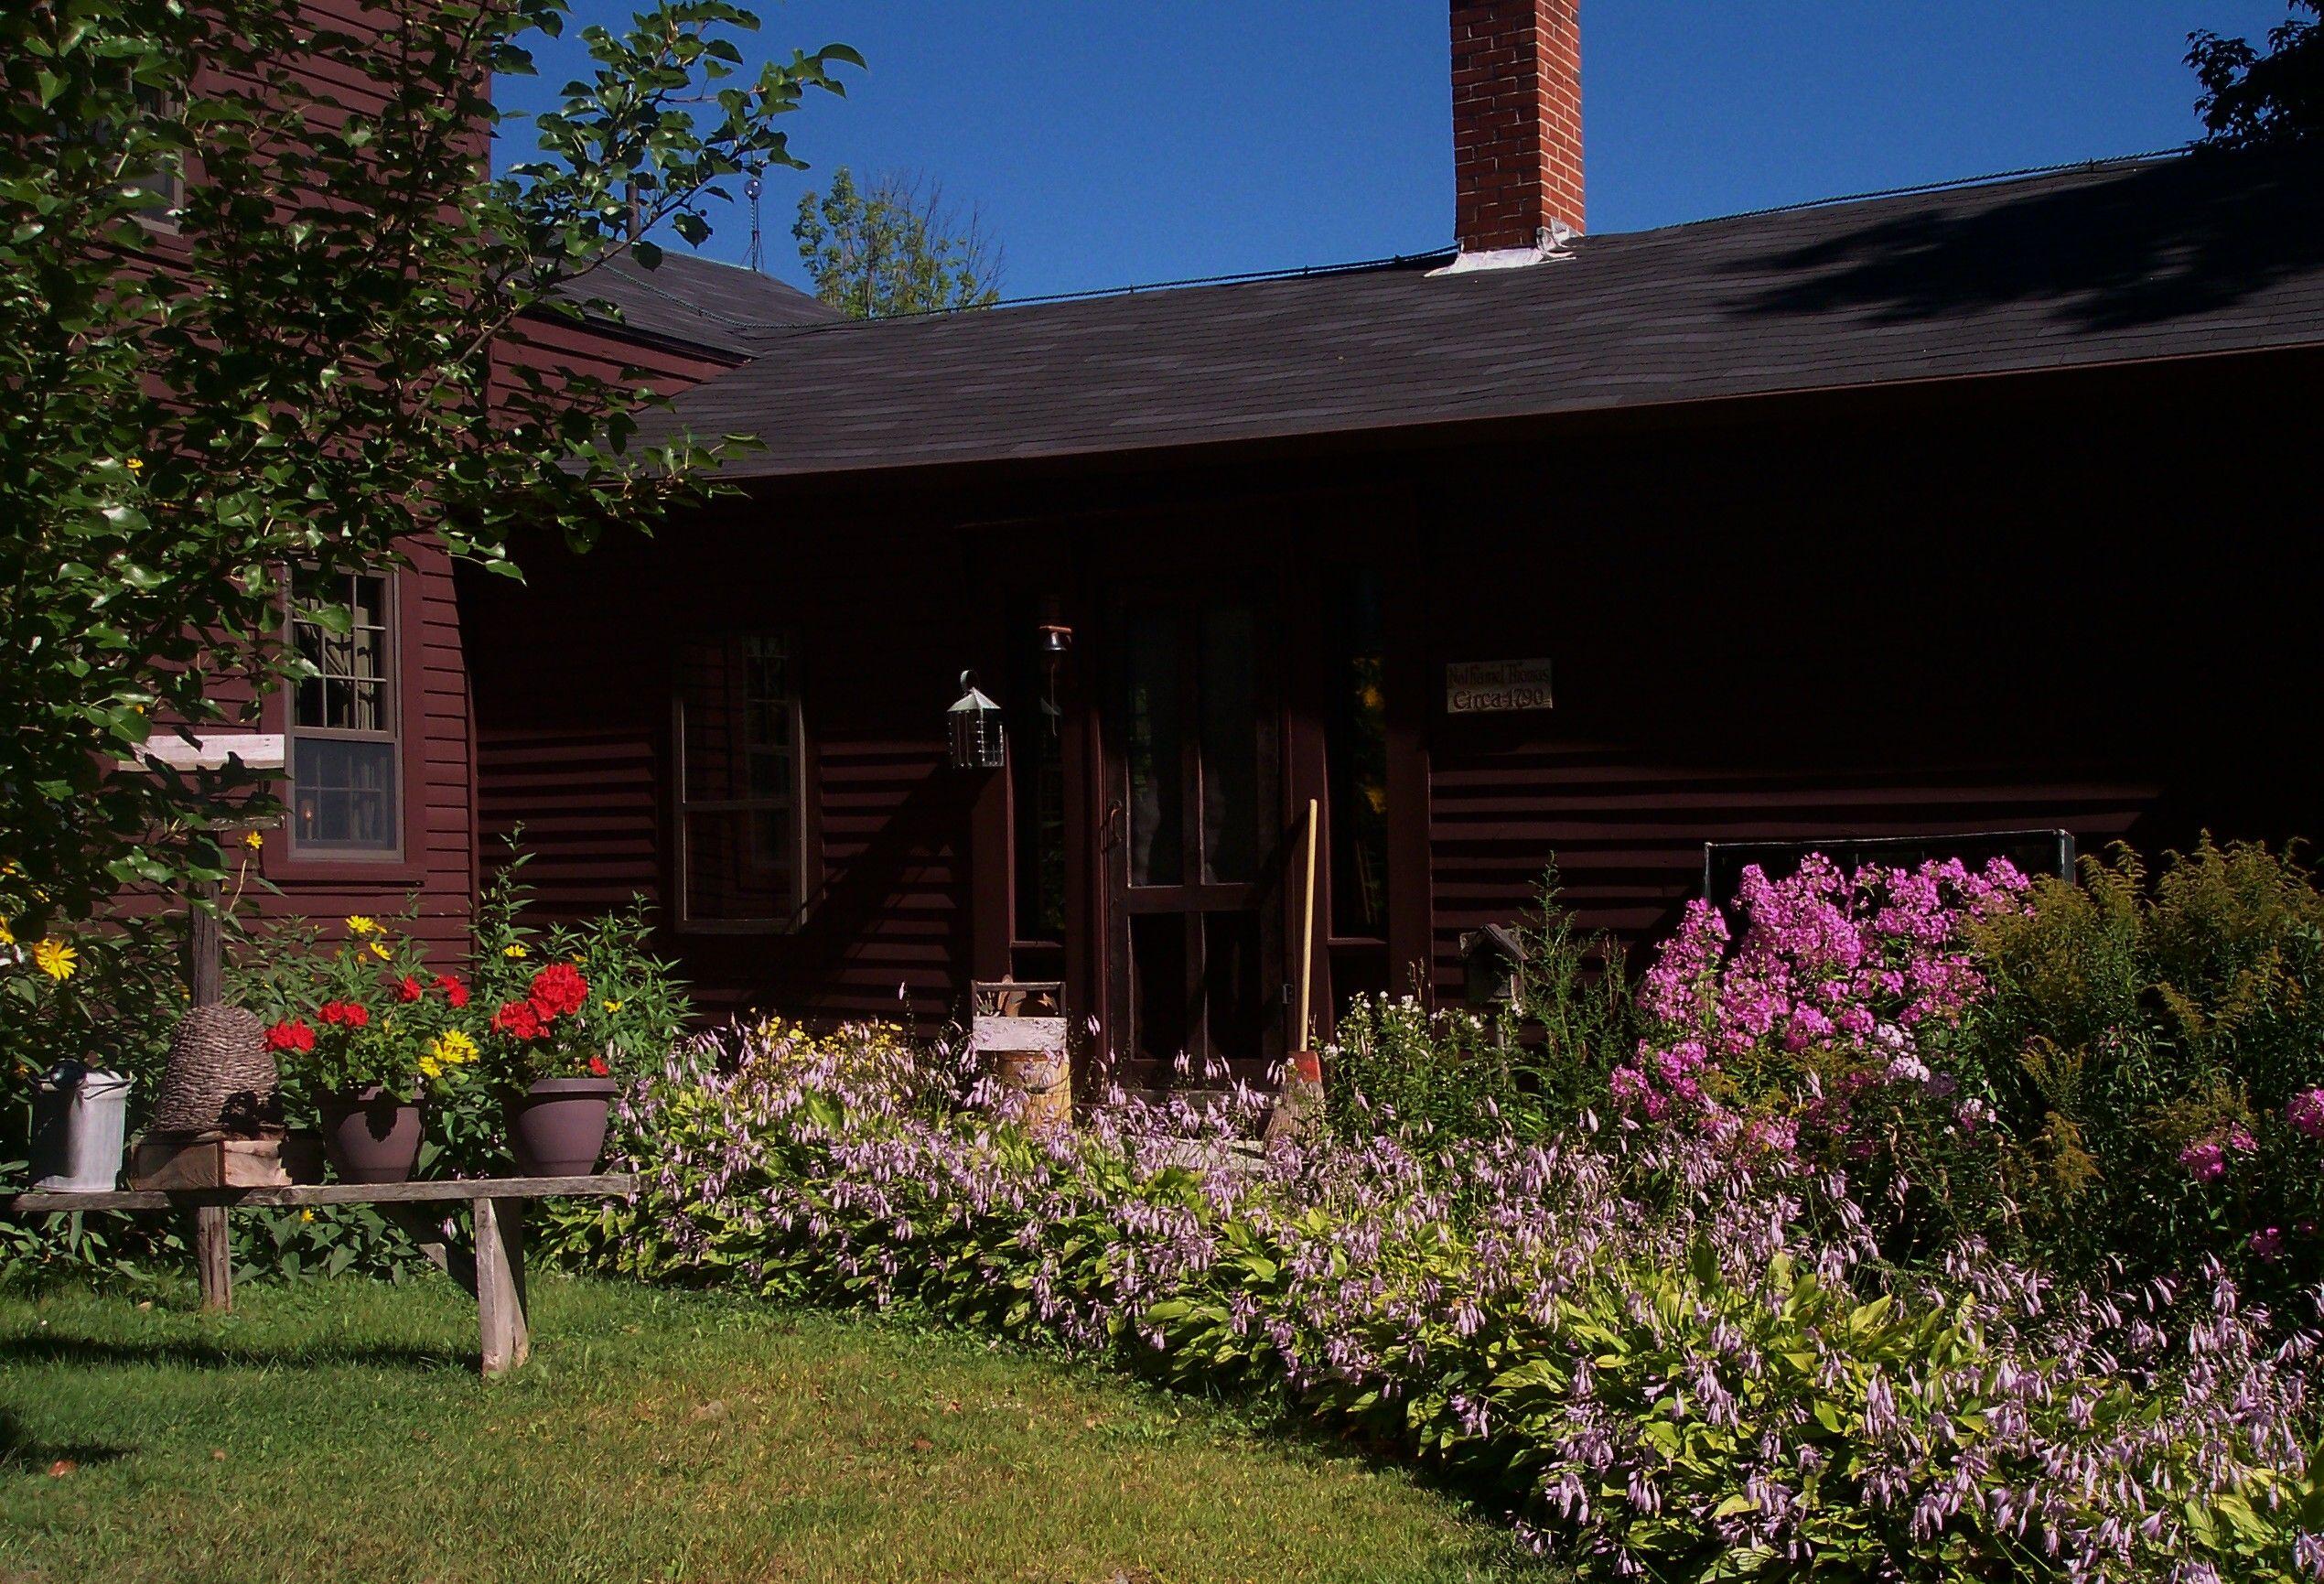 Side entrance | Home pictures, Garden, Entrance